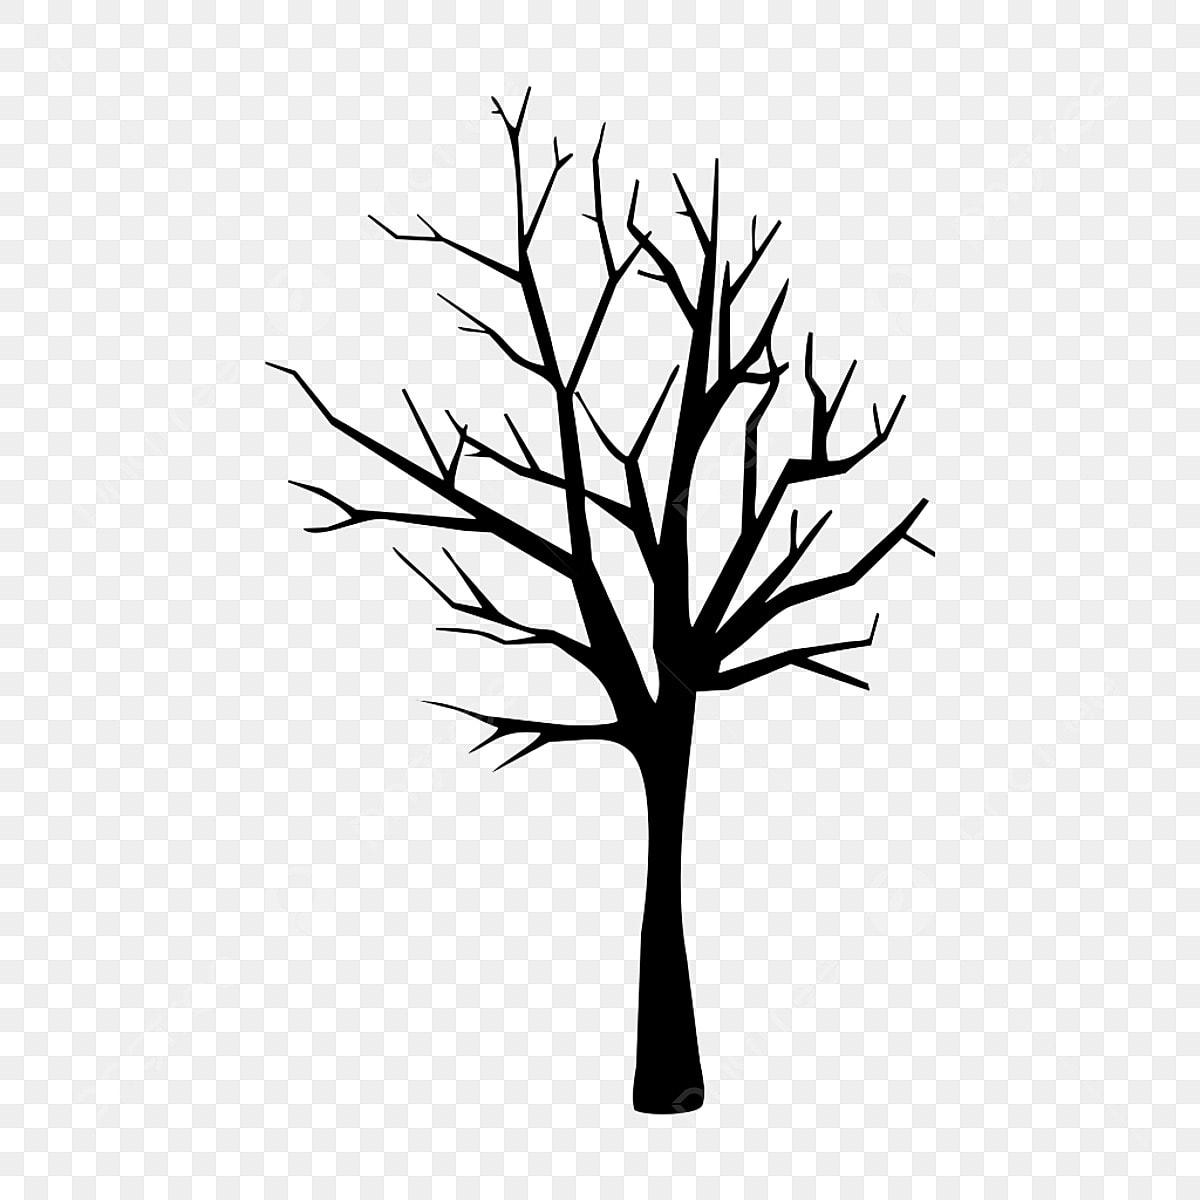 Bare Tree Winter Design Isolated On White Background Stock Vector -  Illustration of tree, black: 129768798